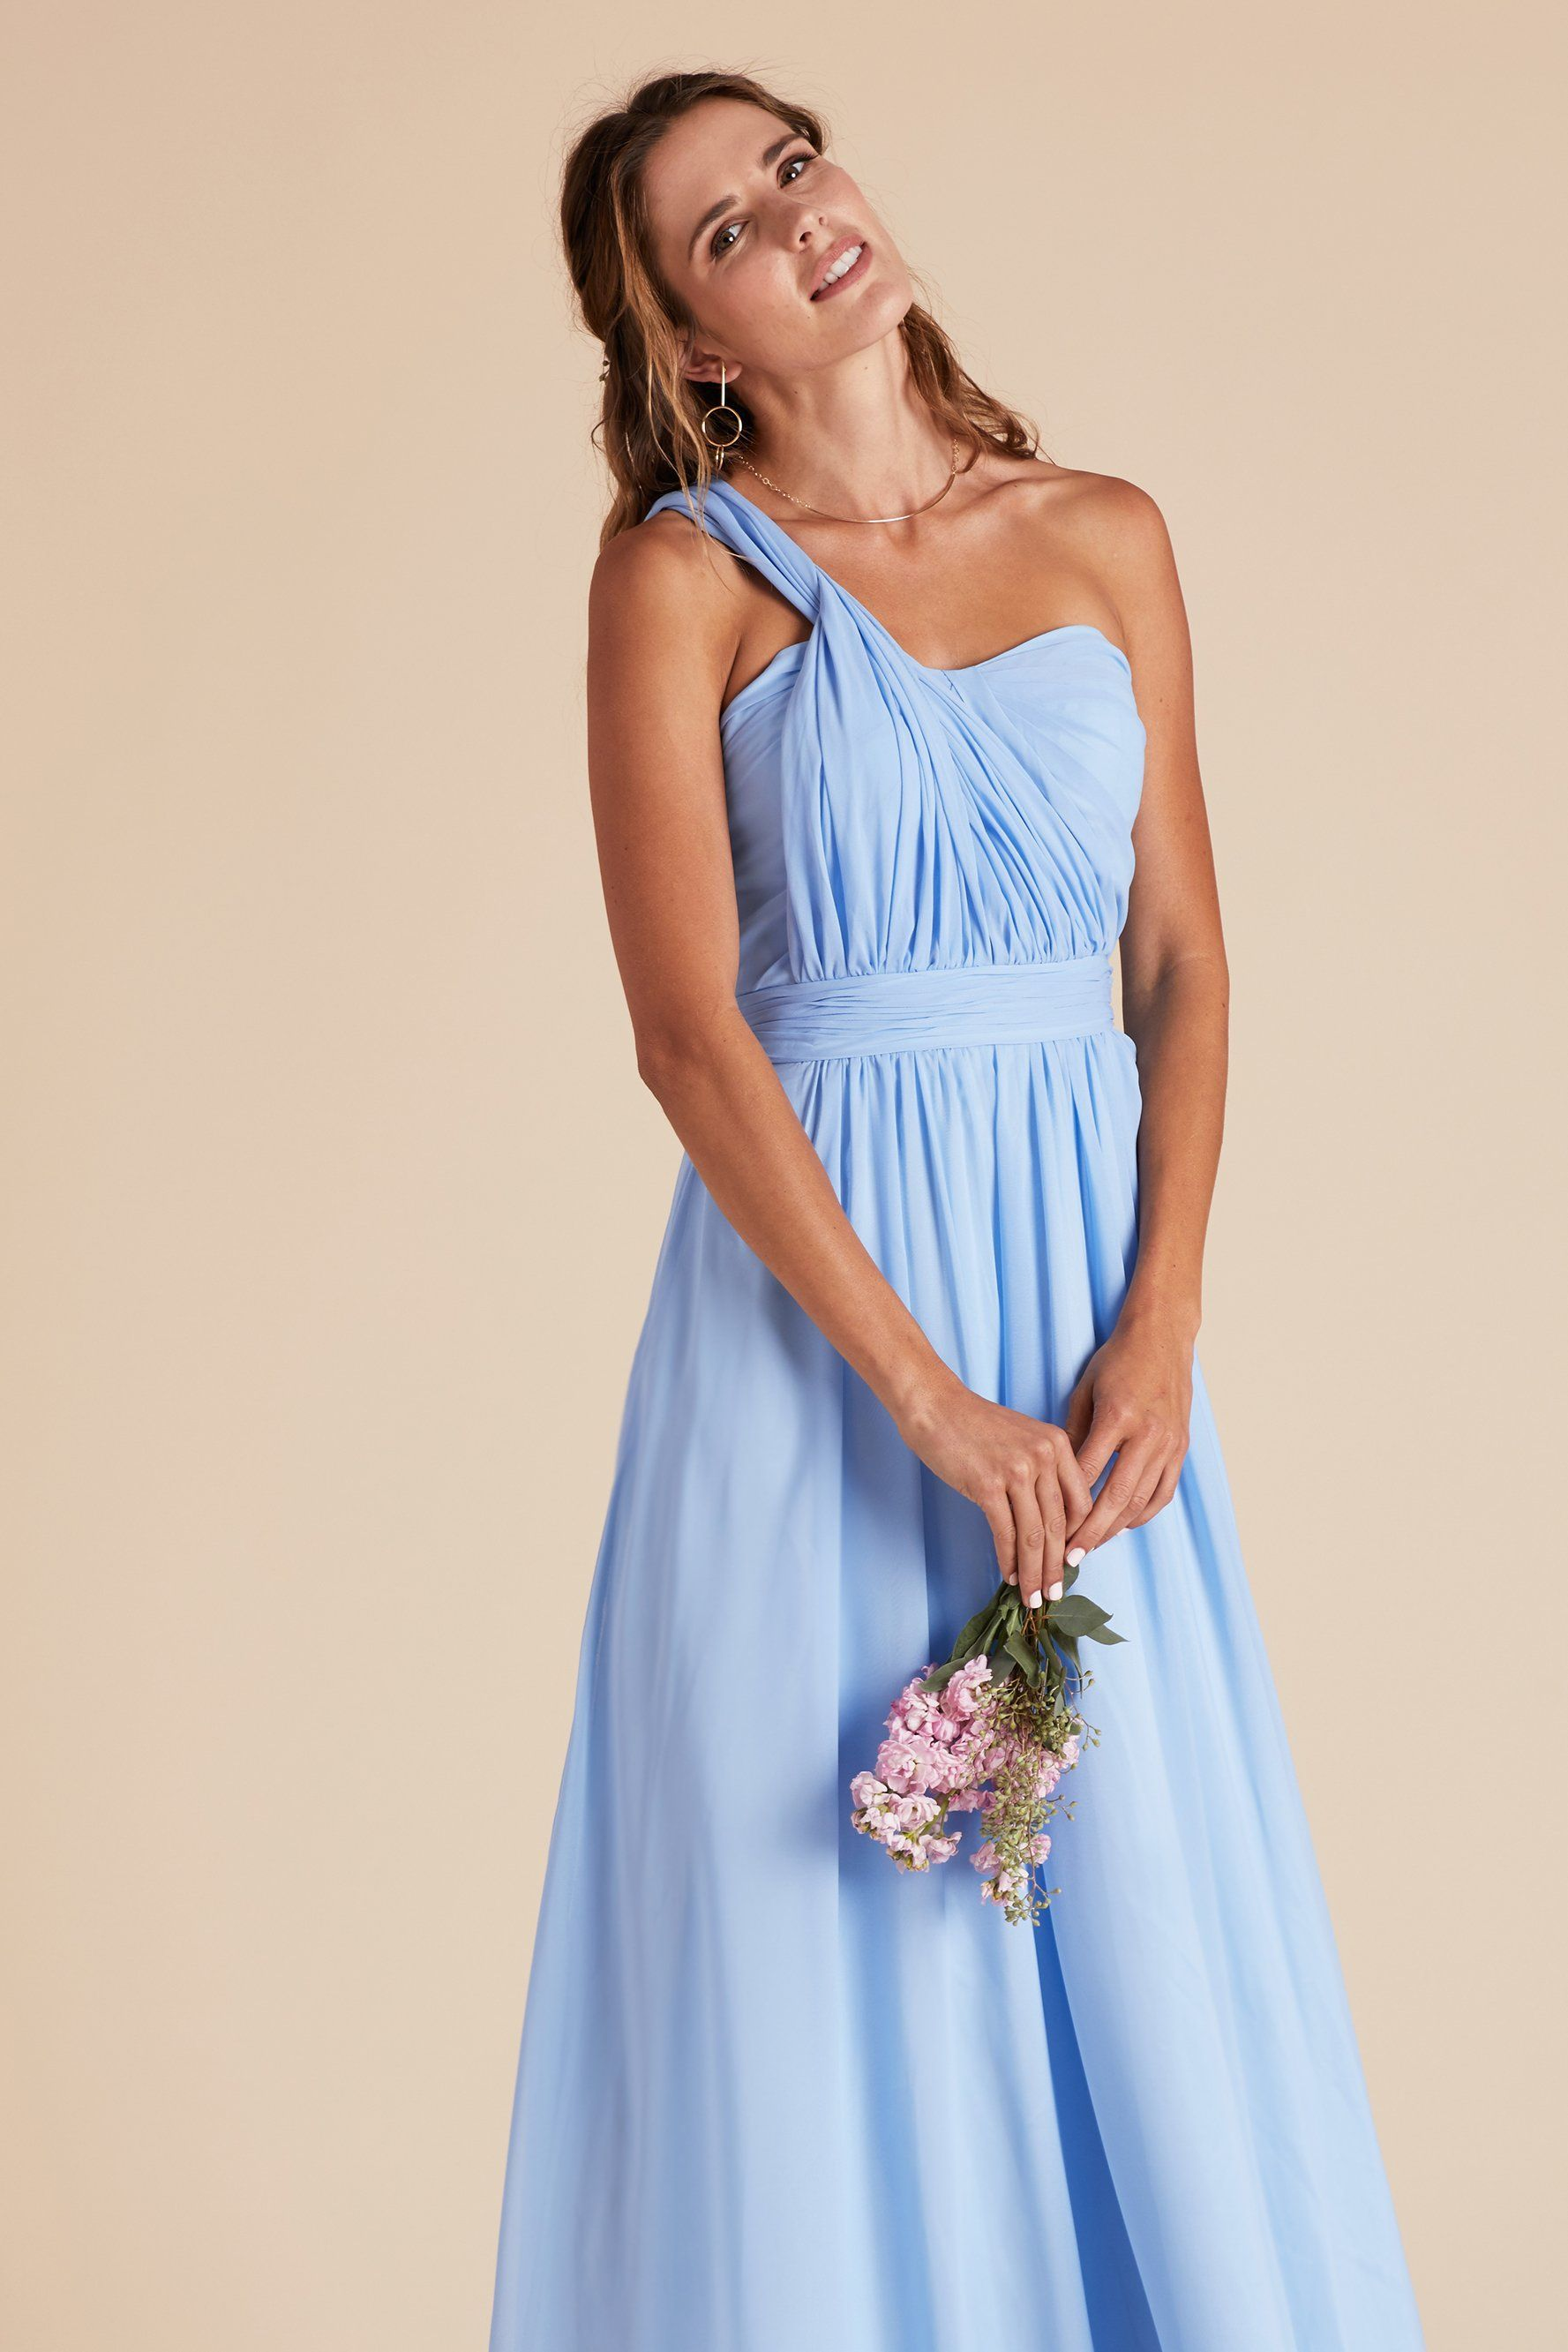 dresses lighting h chiffon dress gallery wedding bridesmaid hm blue m halter light